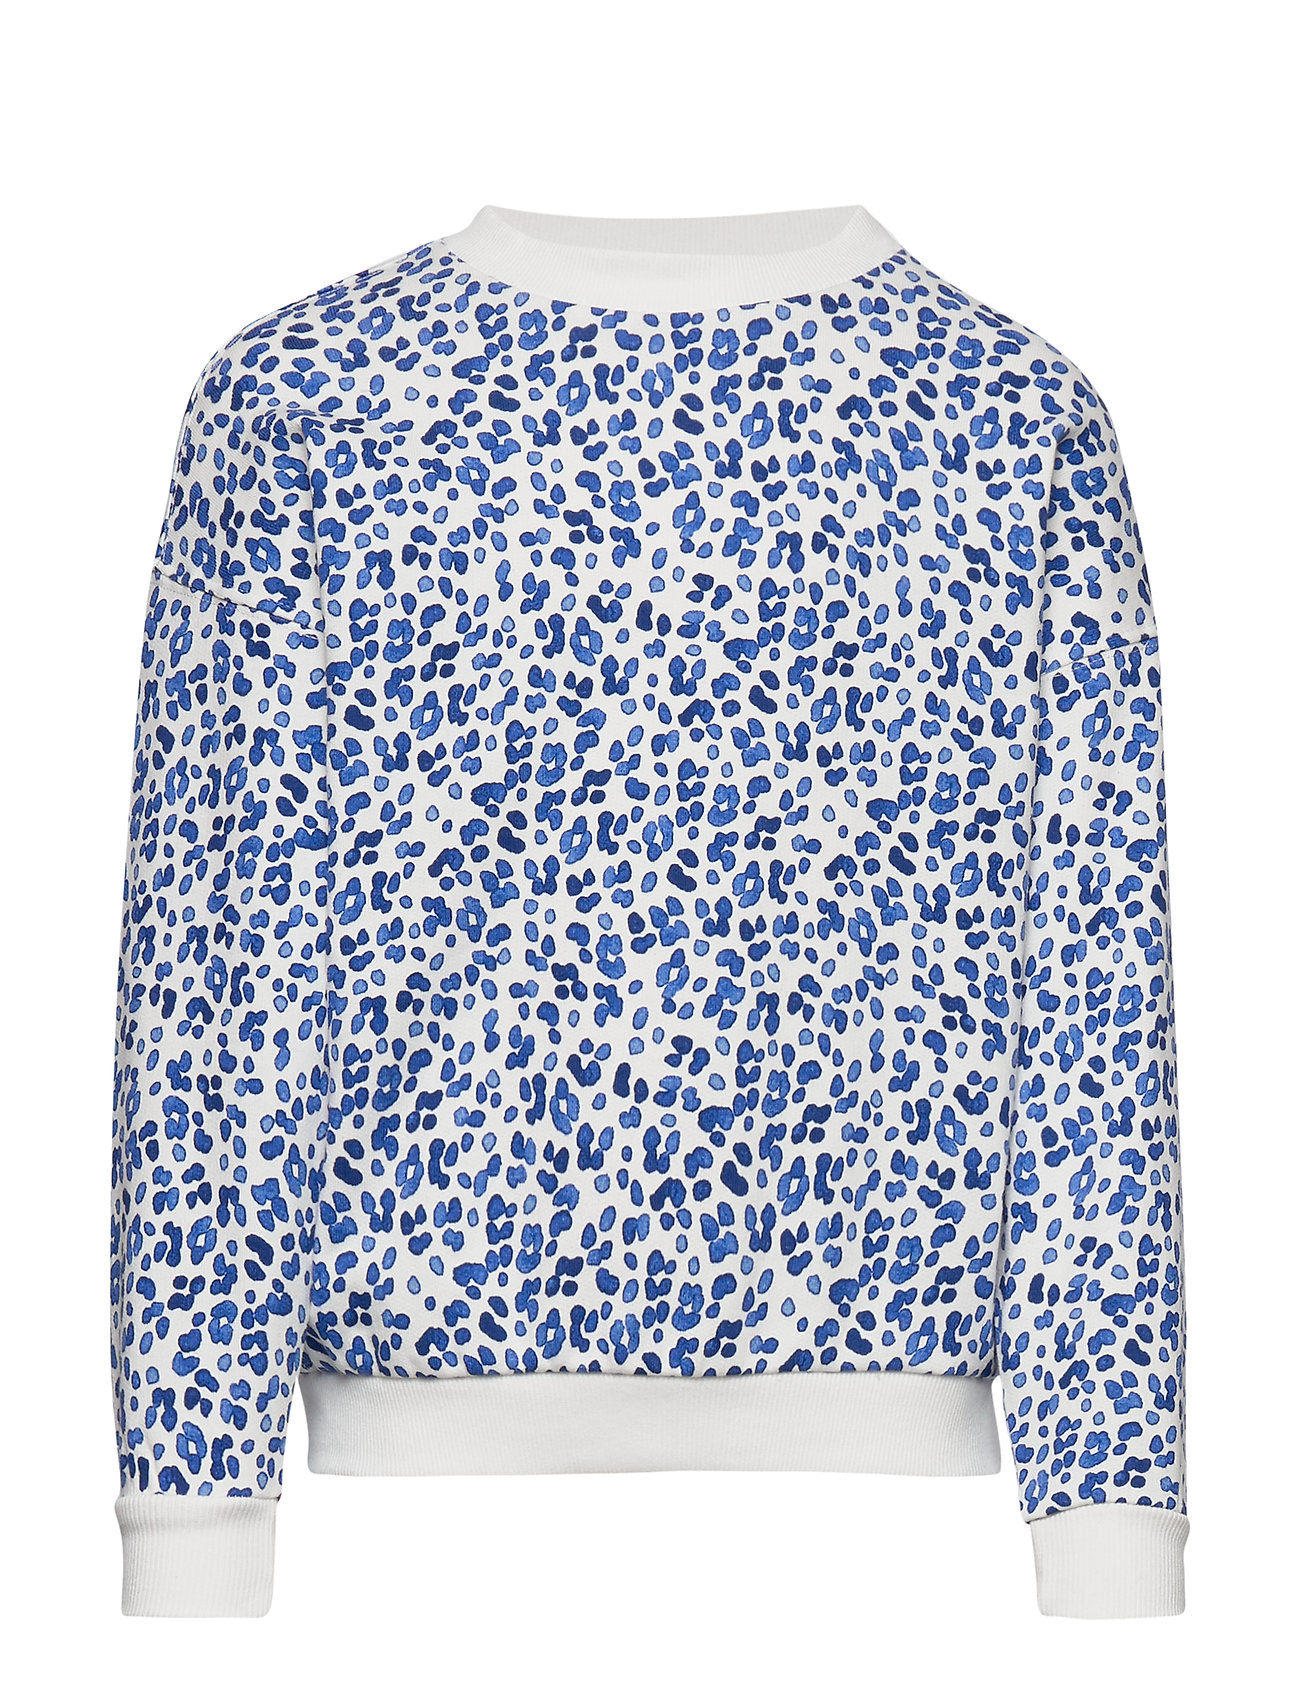 Gina Tricot Mini sweater - LEO BLUE (5533)